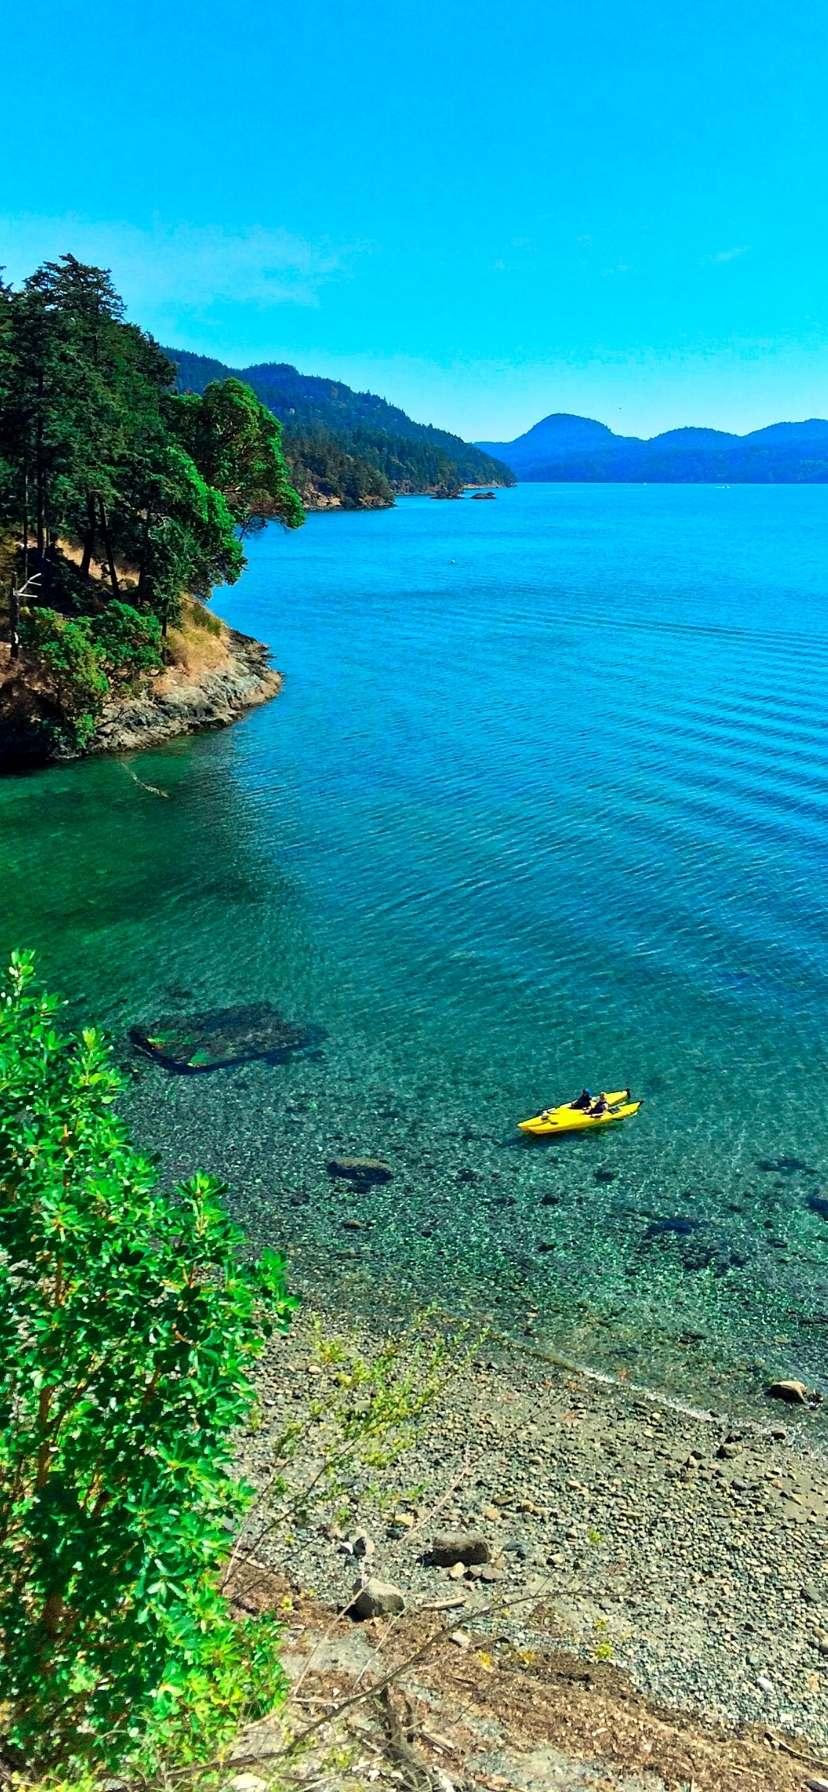 Kayakers on Ships Bay Orcas Island Kayaking in the San Juans